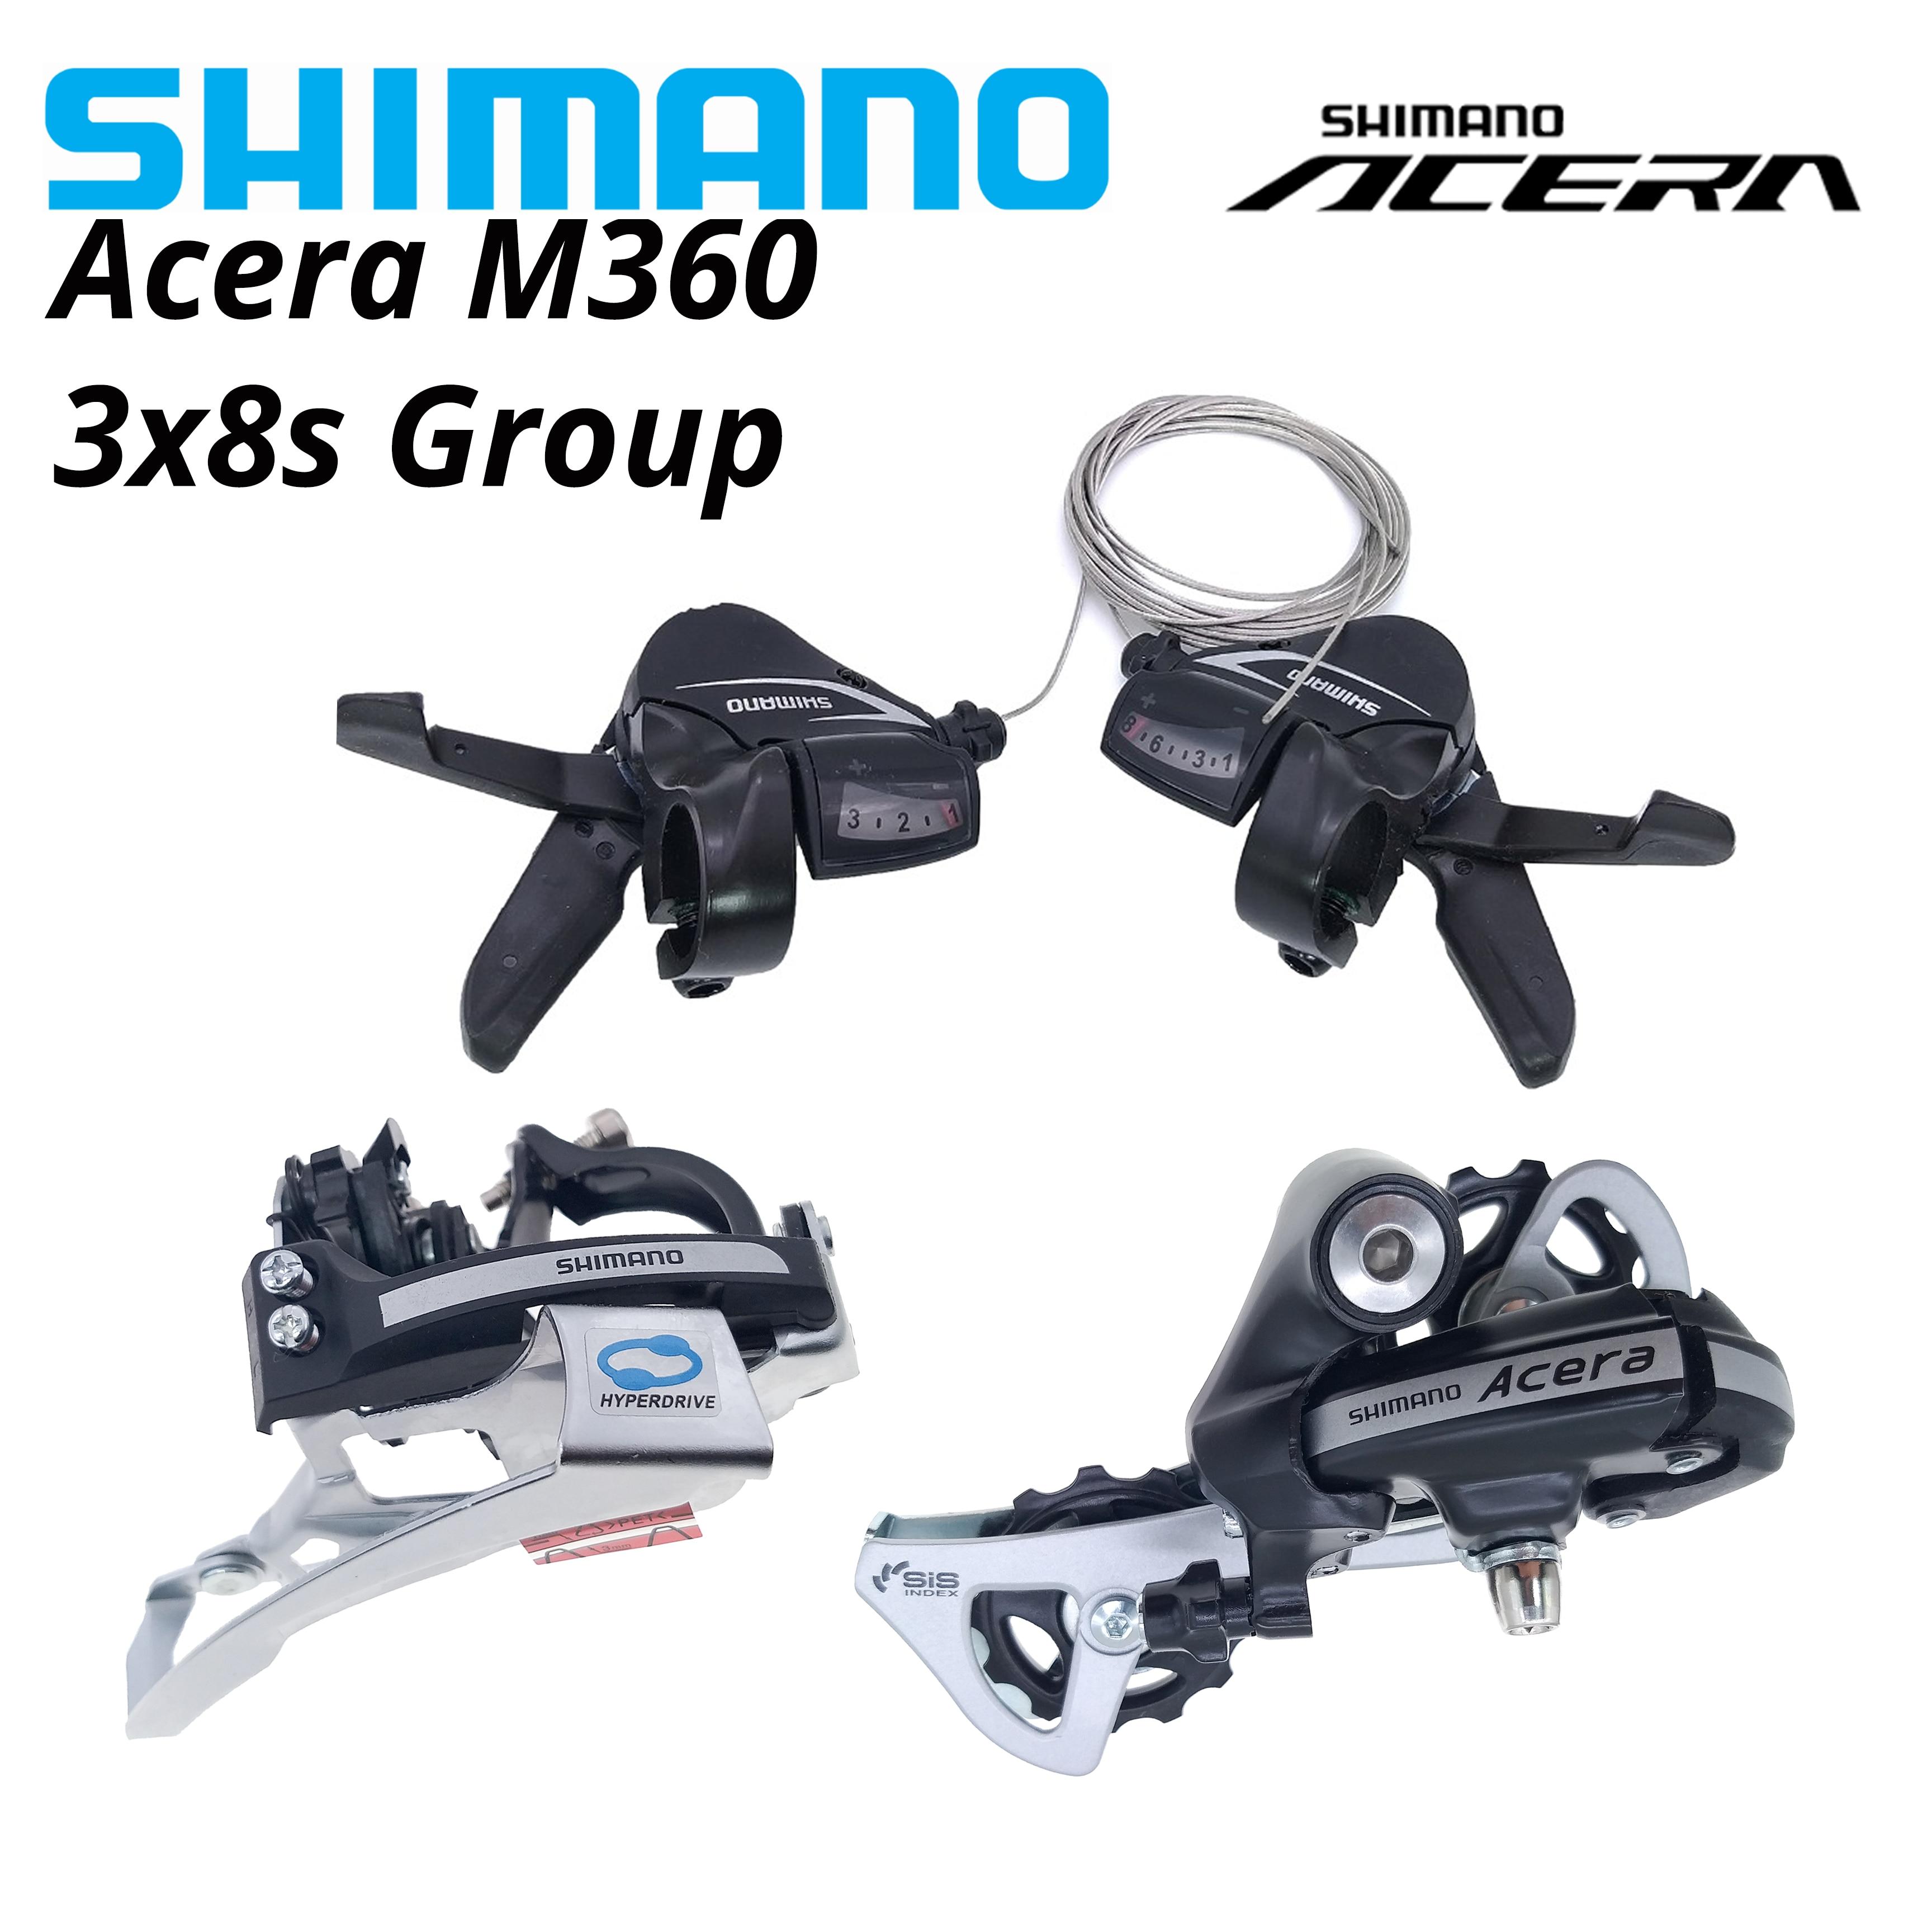 SHIMANO-palanca de cambios de FD-M360 para bicicleta palanca de cambios de 24v...